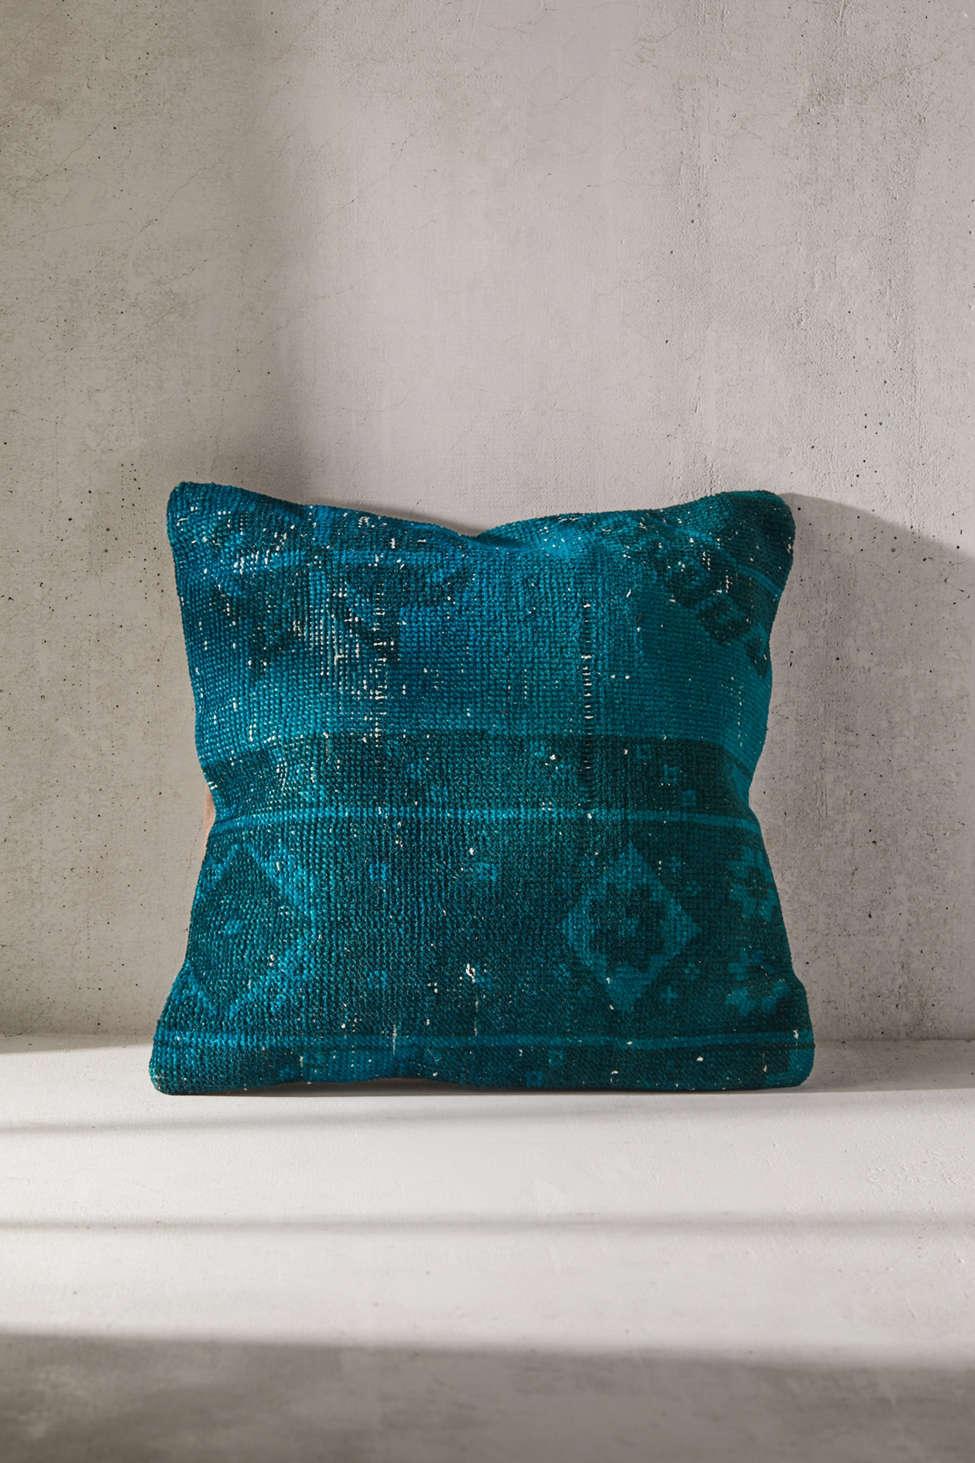 Slide View: 1: Urban Renewal Reclaimed Kilim Throw Pillow